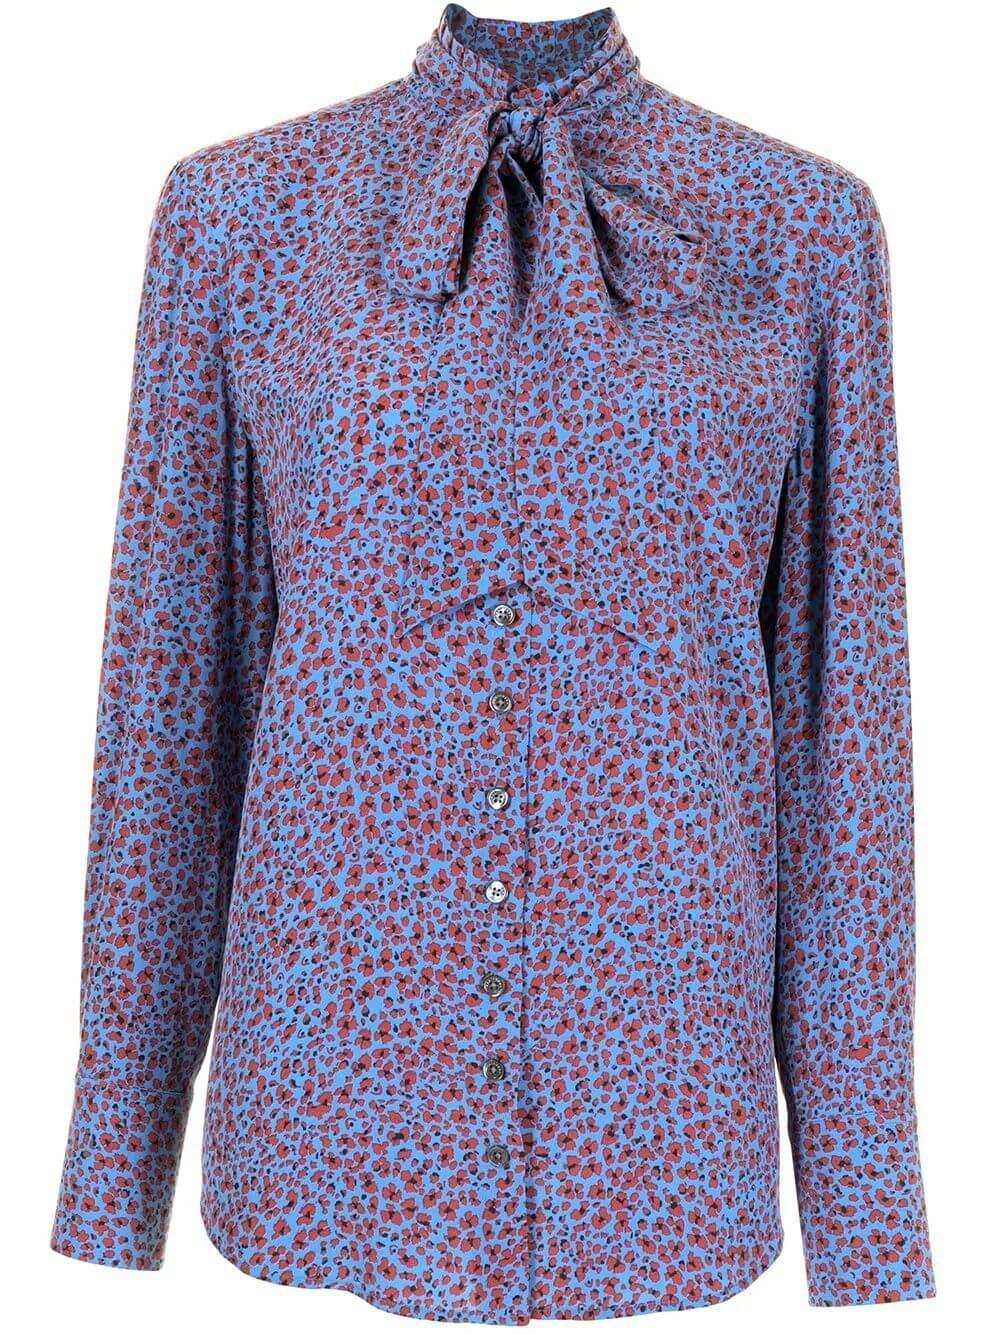 Olexa Floral Print Blouse Item # 21-1-008335-TP04617